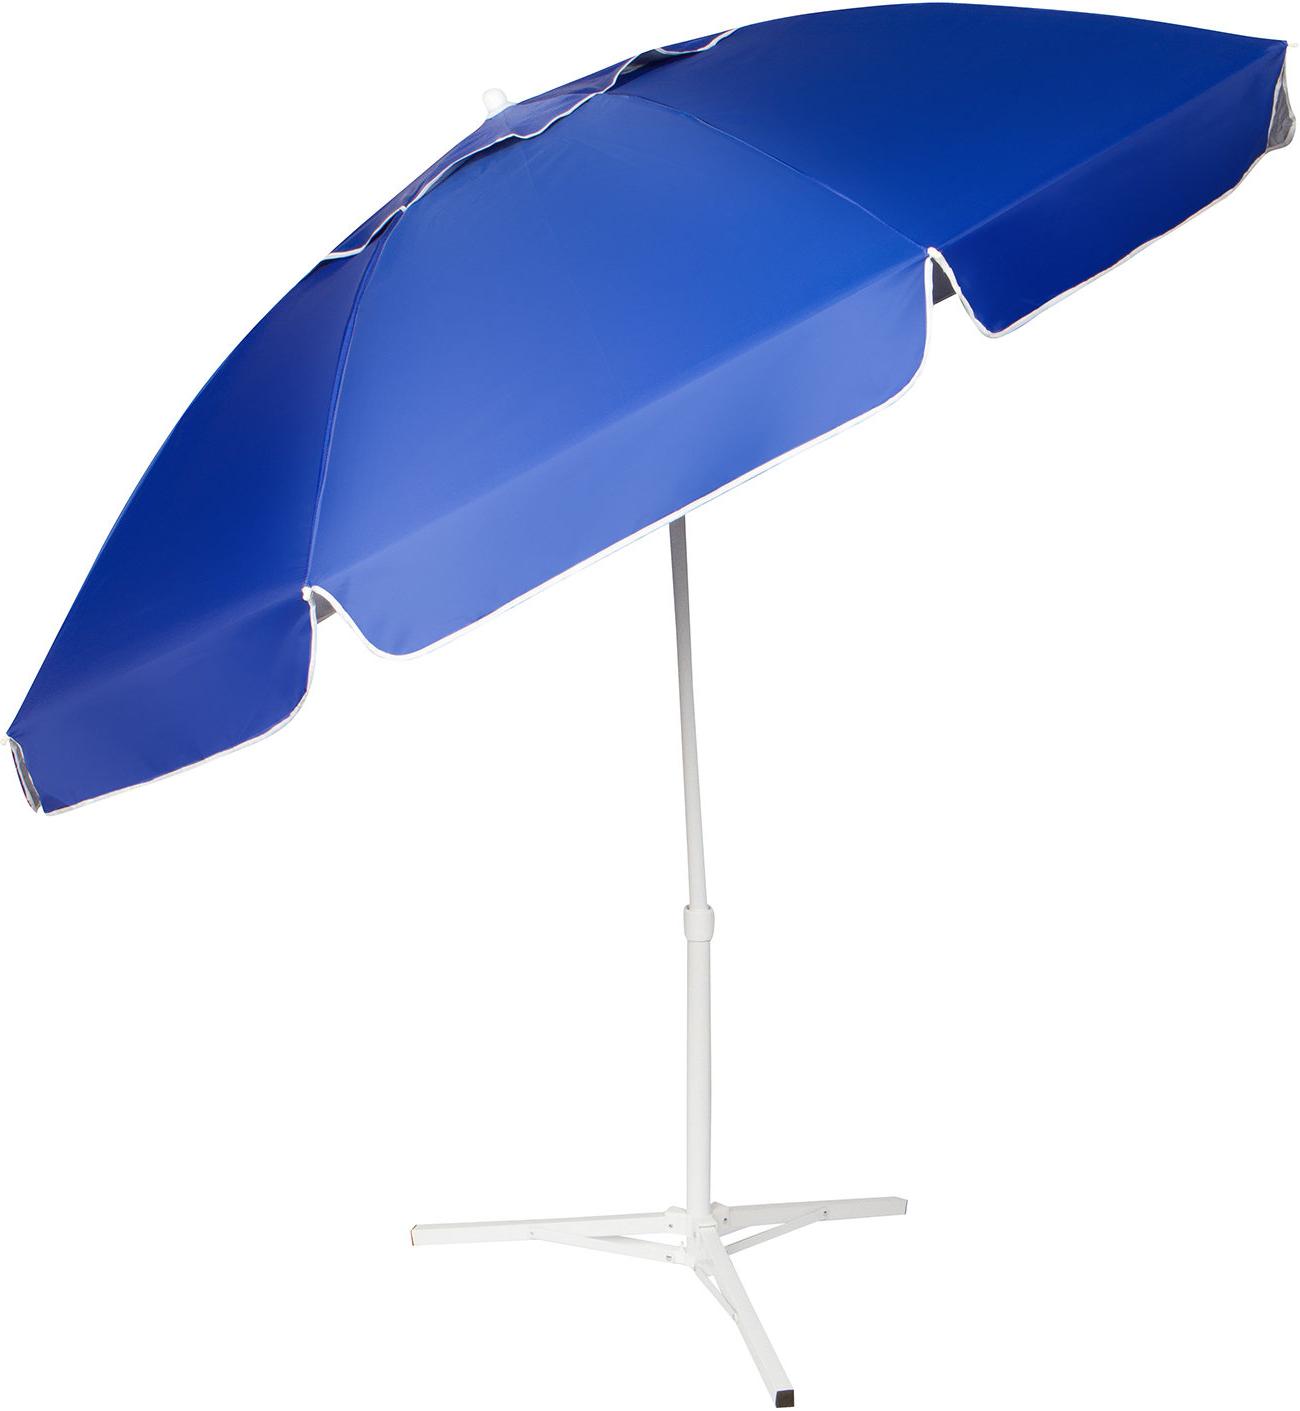 Alyson Joeshade Beach Umbrellas Inside Newest Peachey Portable Beach And Sports 7' Market Umbrella (View 4 of 20)